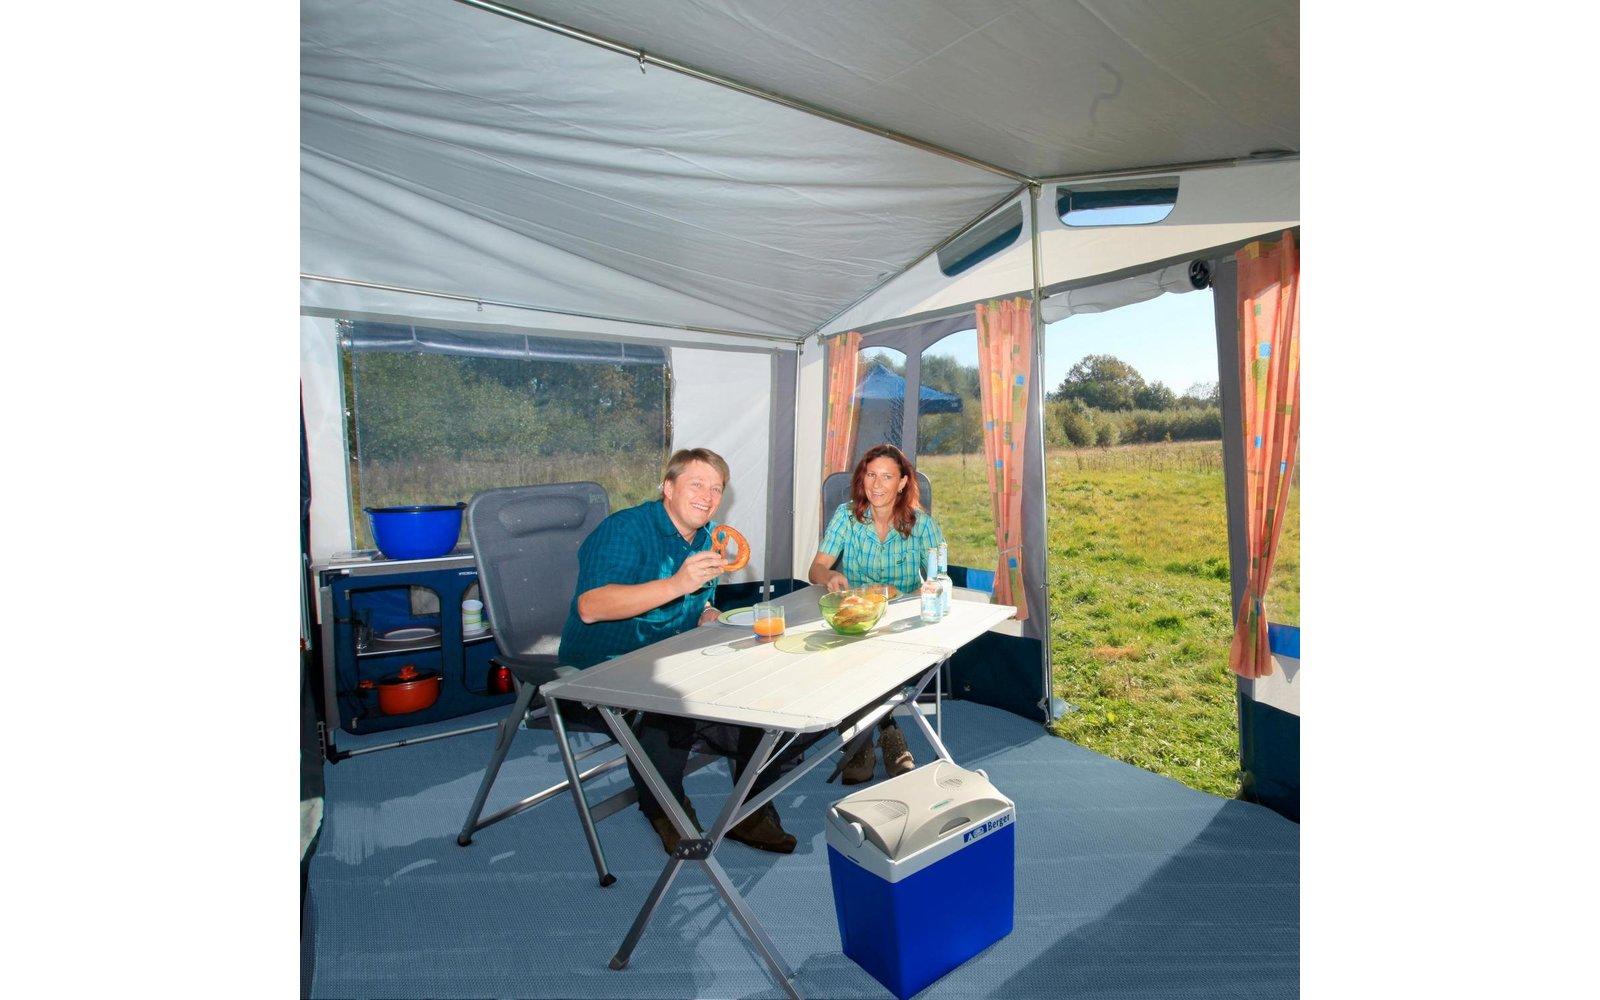 vorzeltteppich berger soft 450 meterware fritz berger campingbedarf. Black Bedroom Furniture Sets. Home Design Ideas